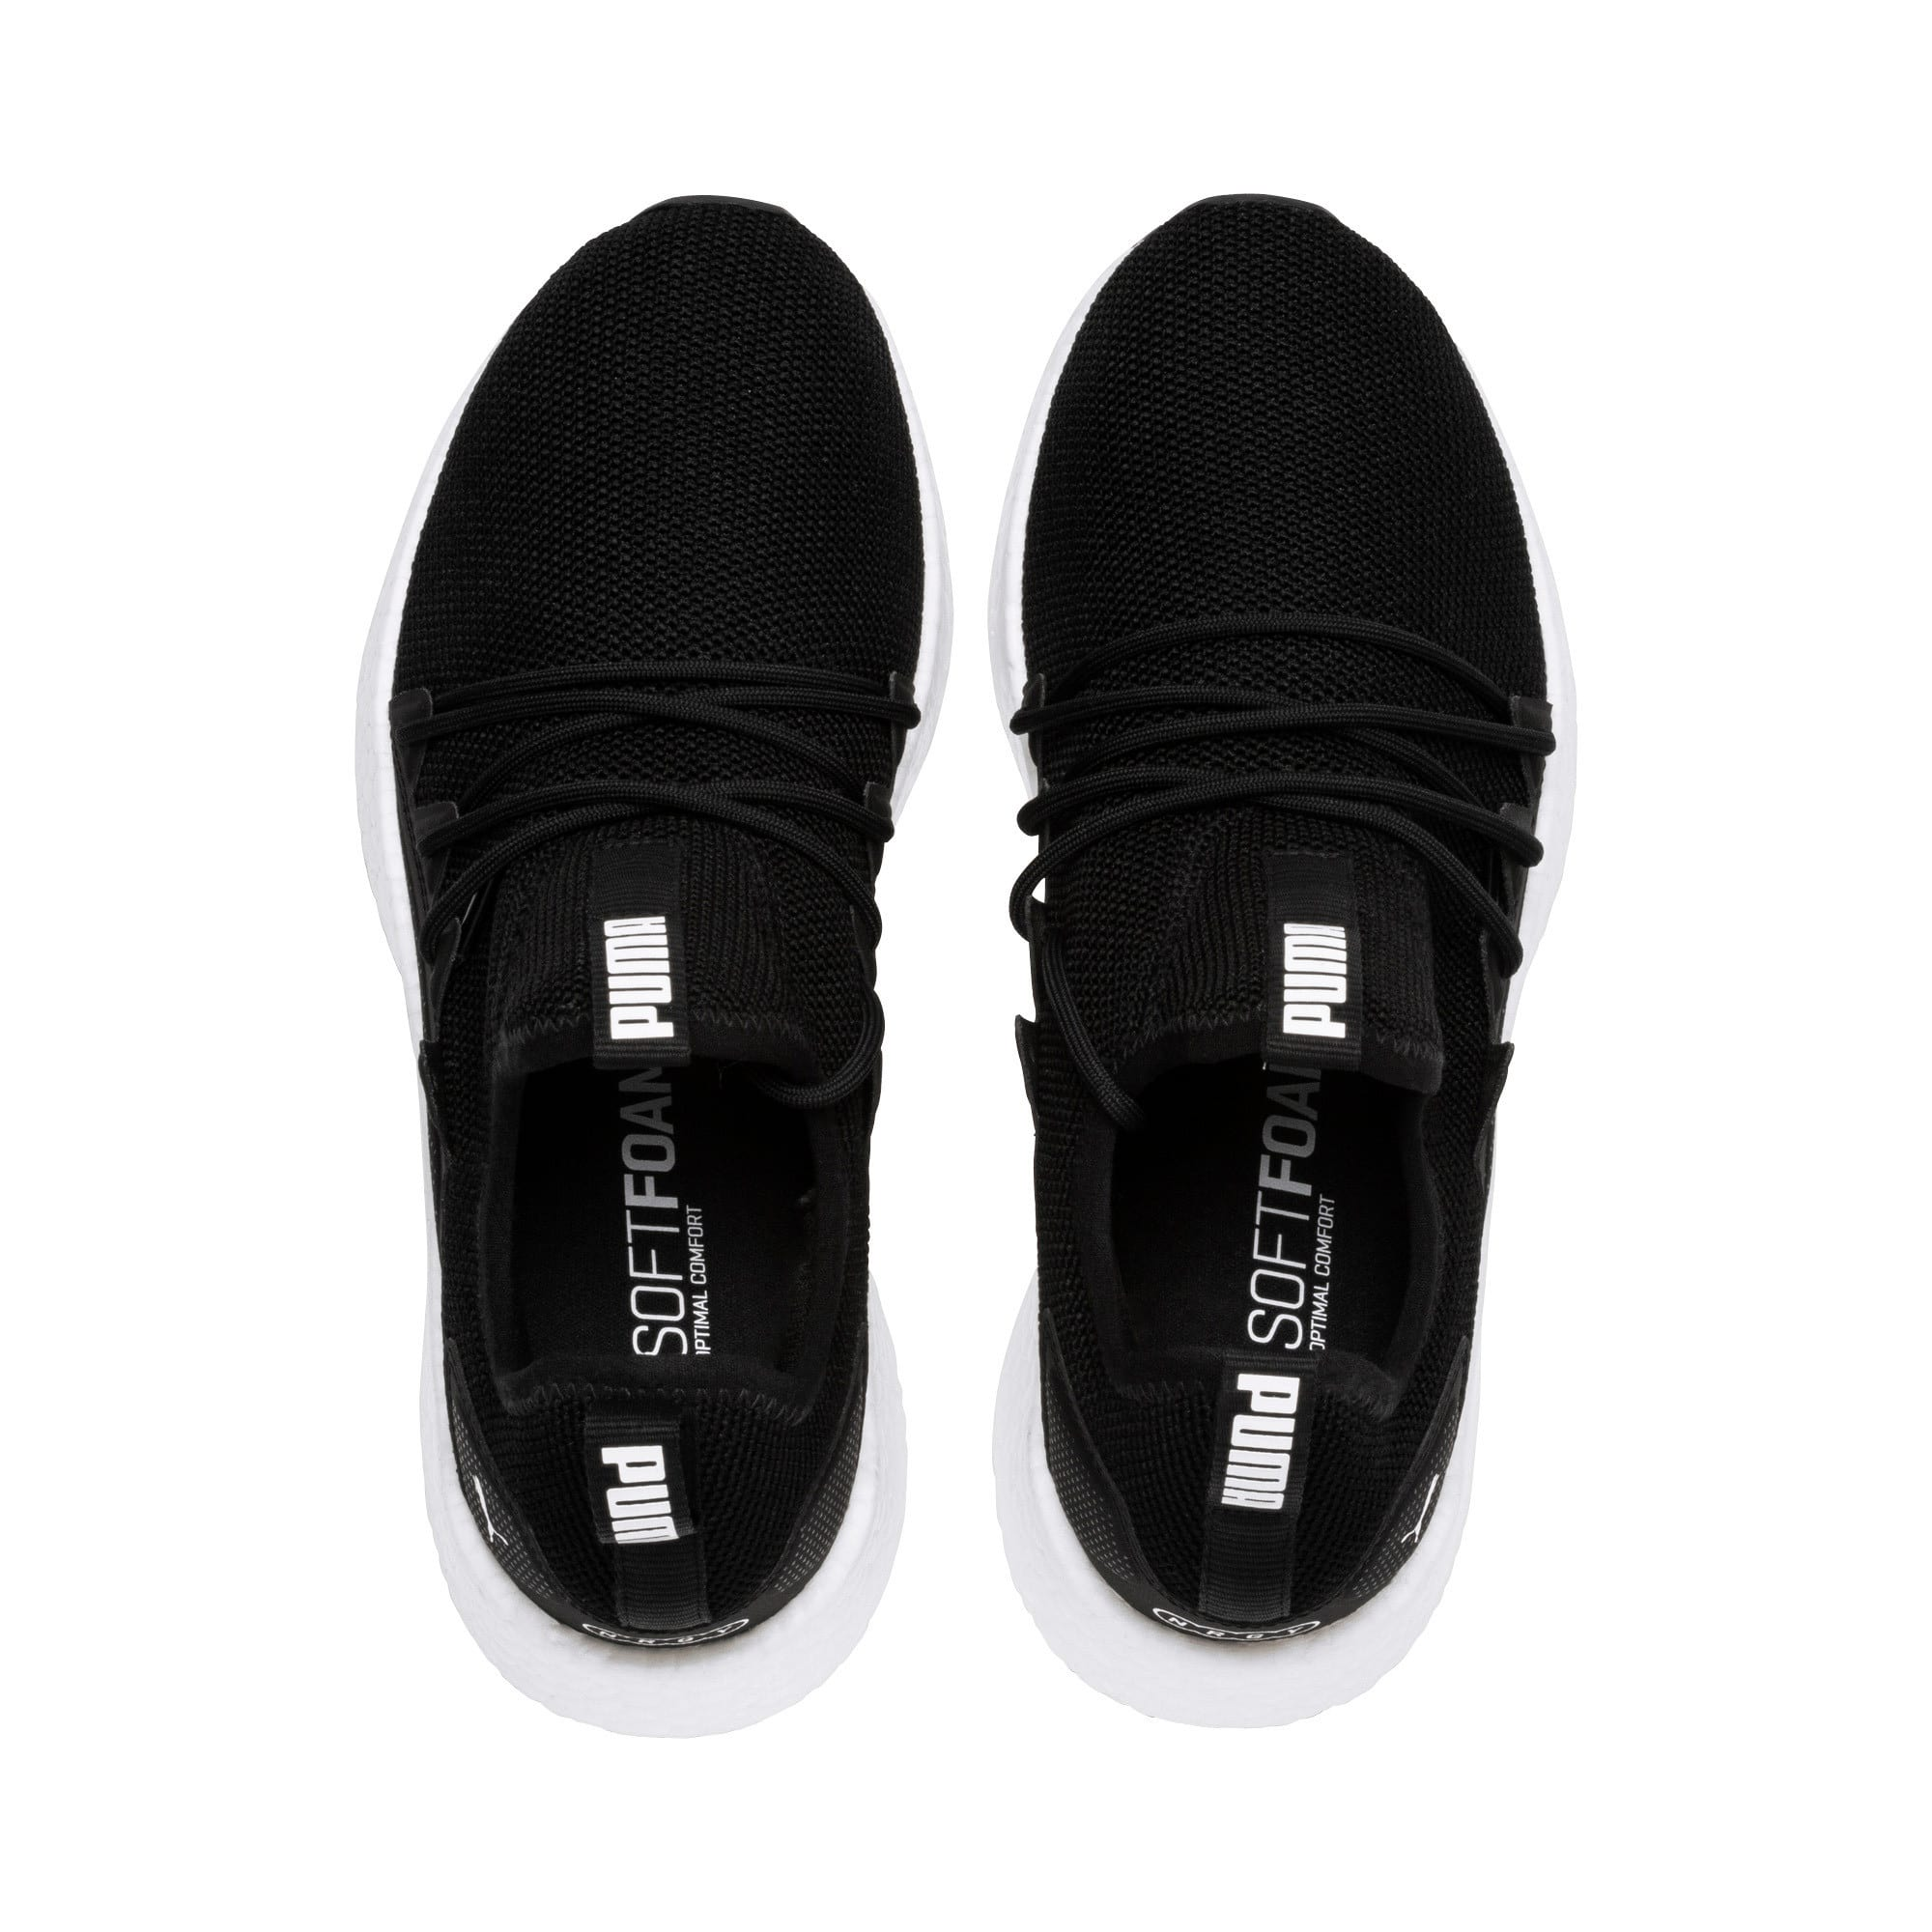 Thumbnail 6 of NRGY Neko Women's Running Shoes, Puma Black-Puma White, medium